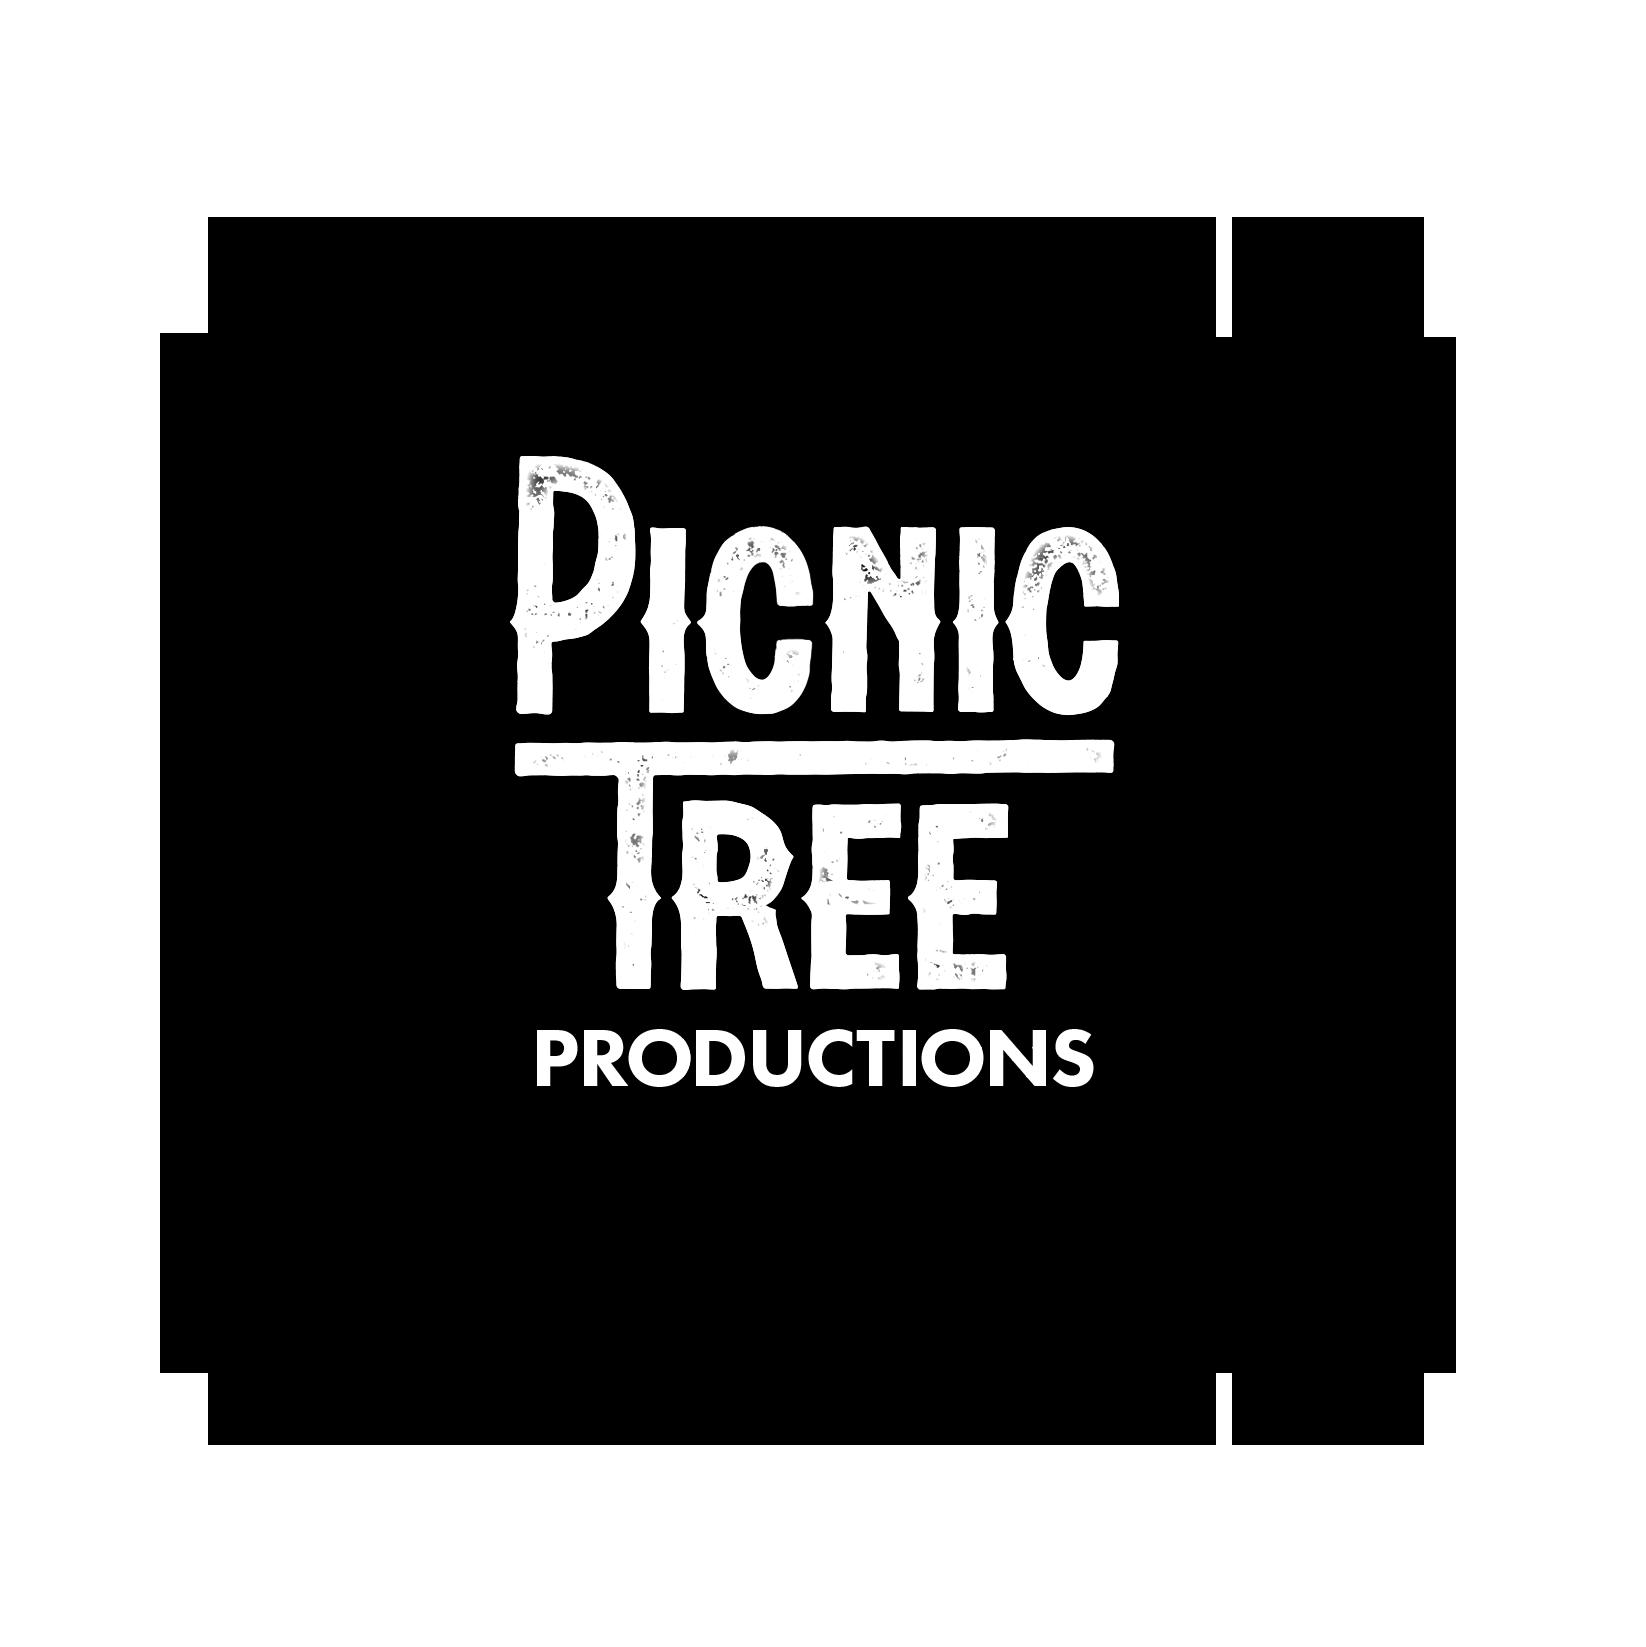 austin-saylor-picnic-tree-productions-logo